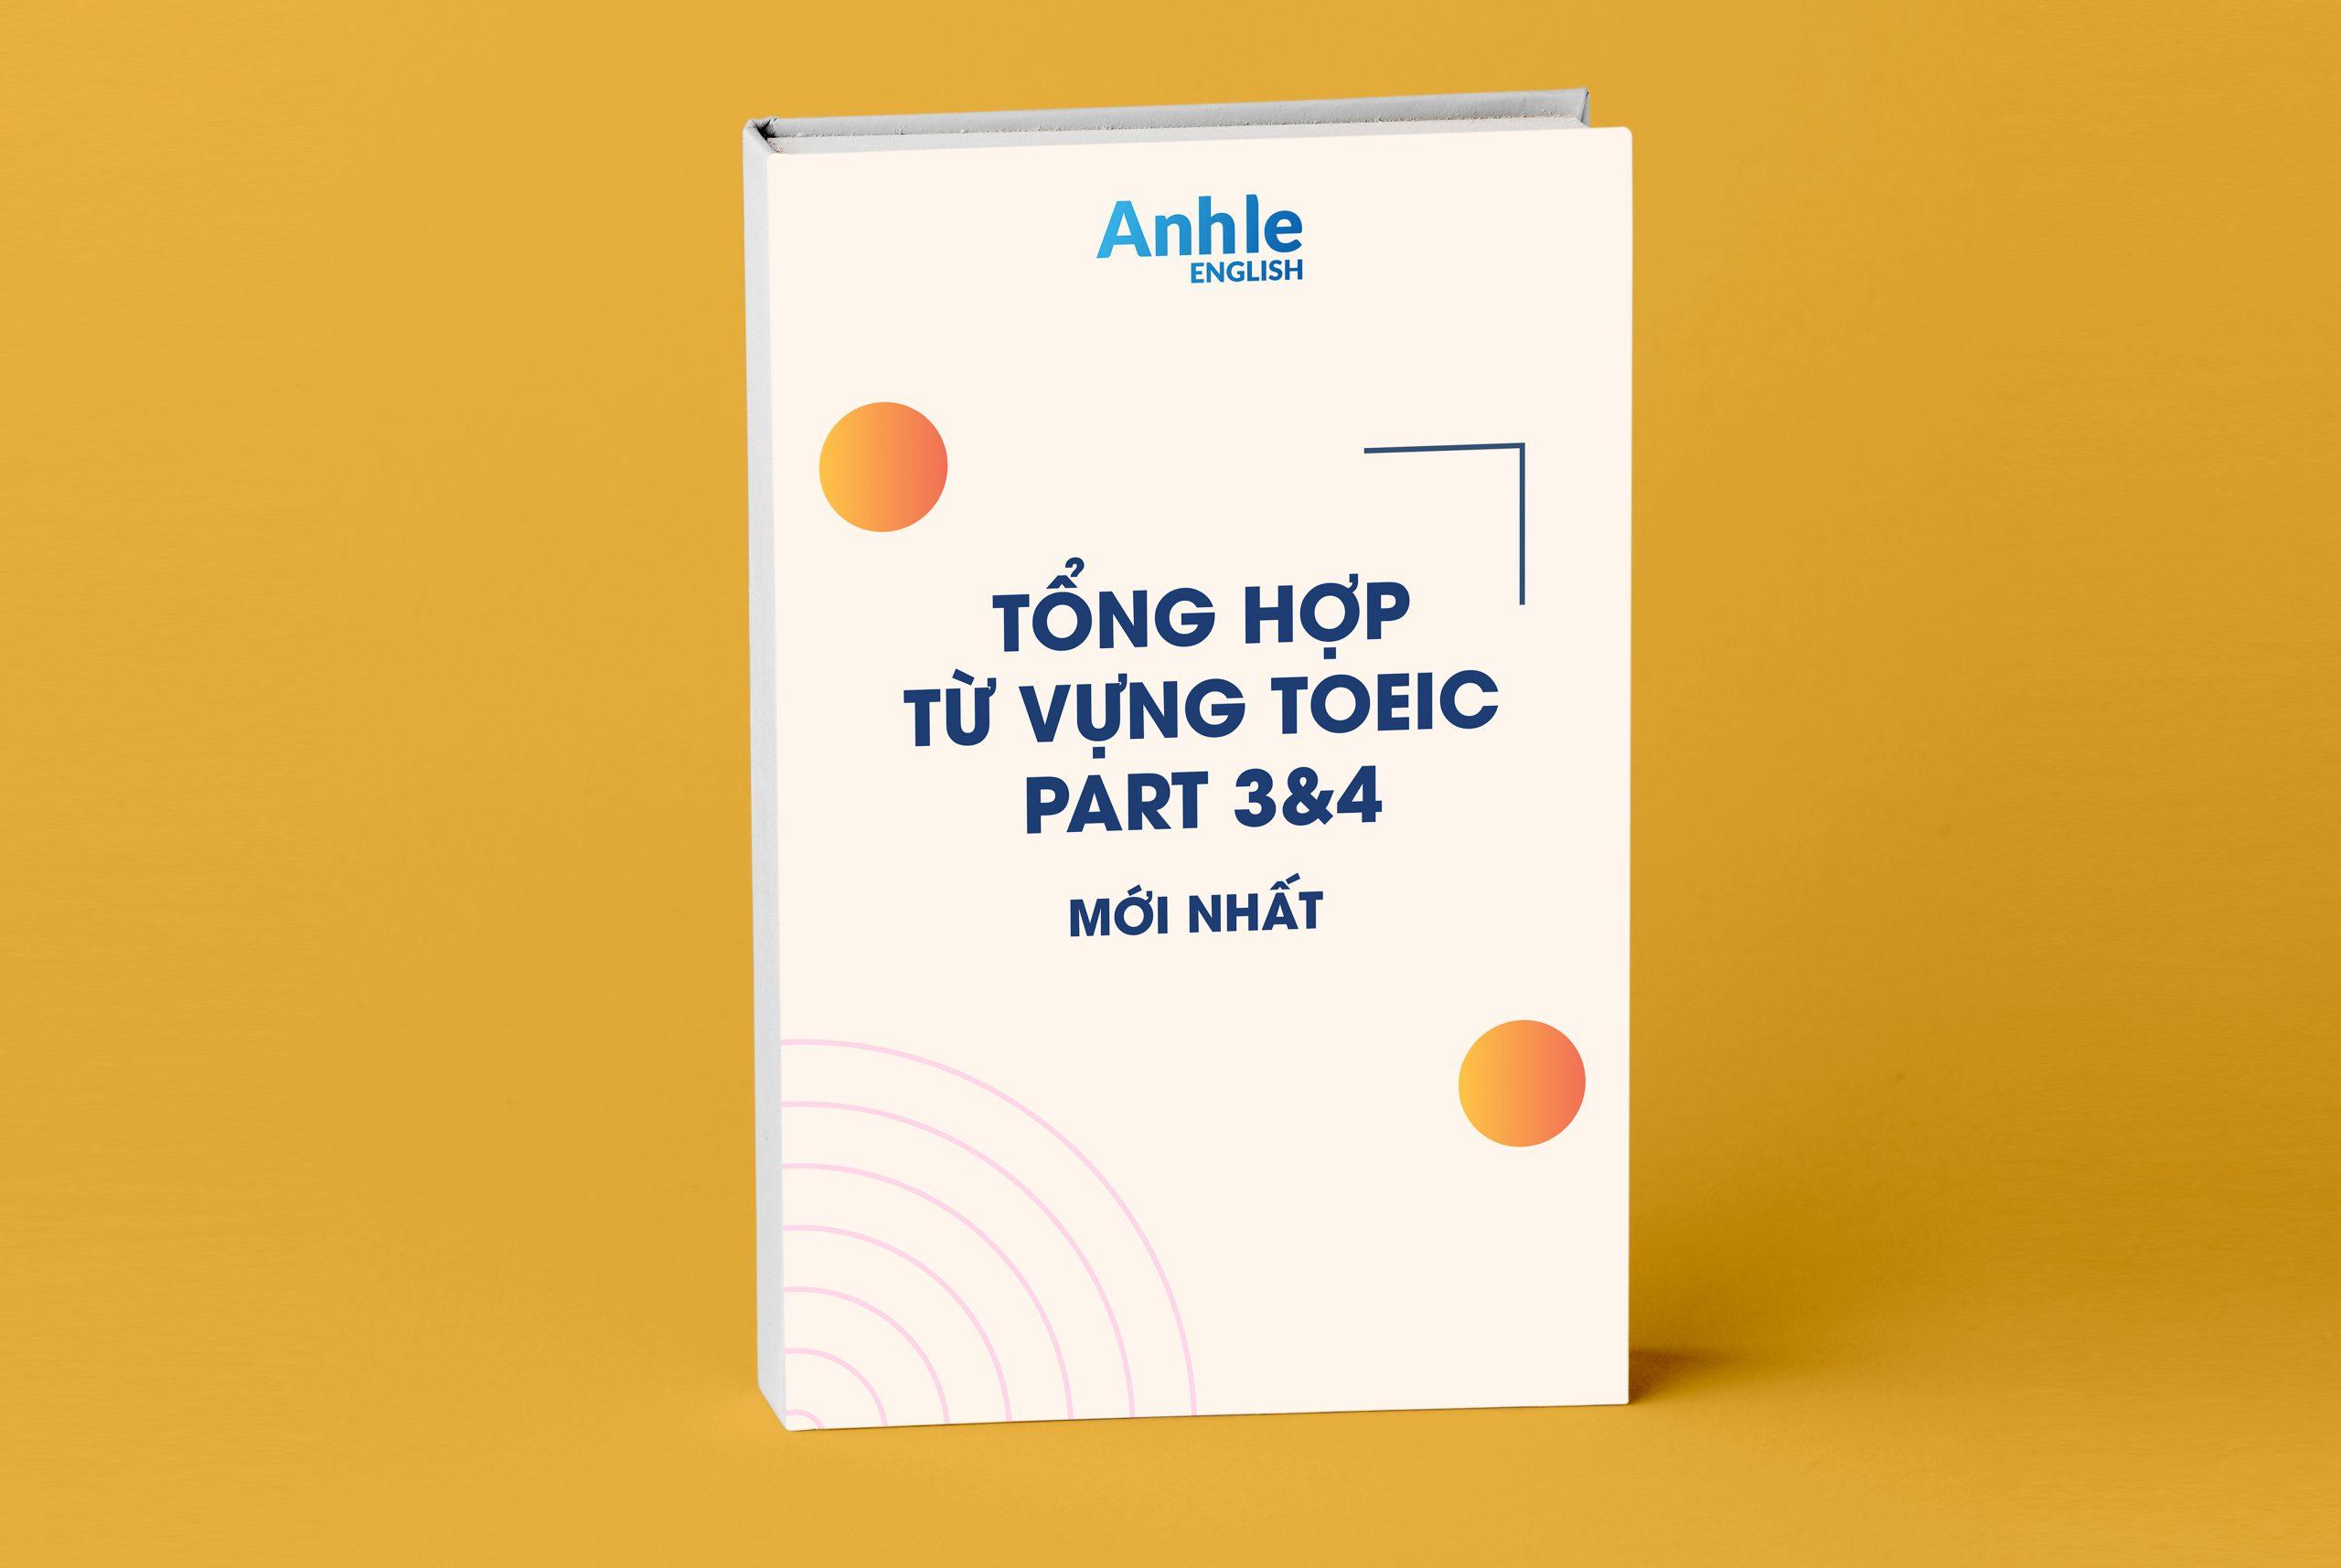 tong-hop-tu-vung-part-34-toeic